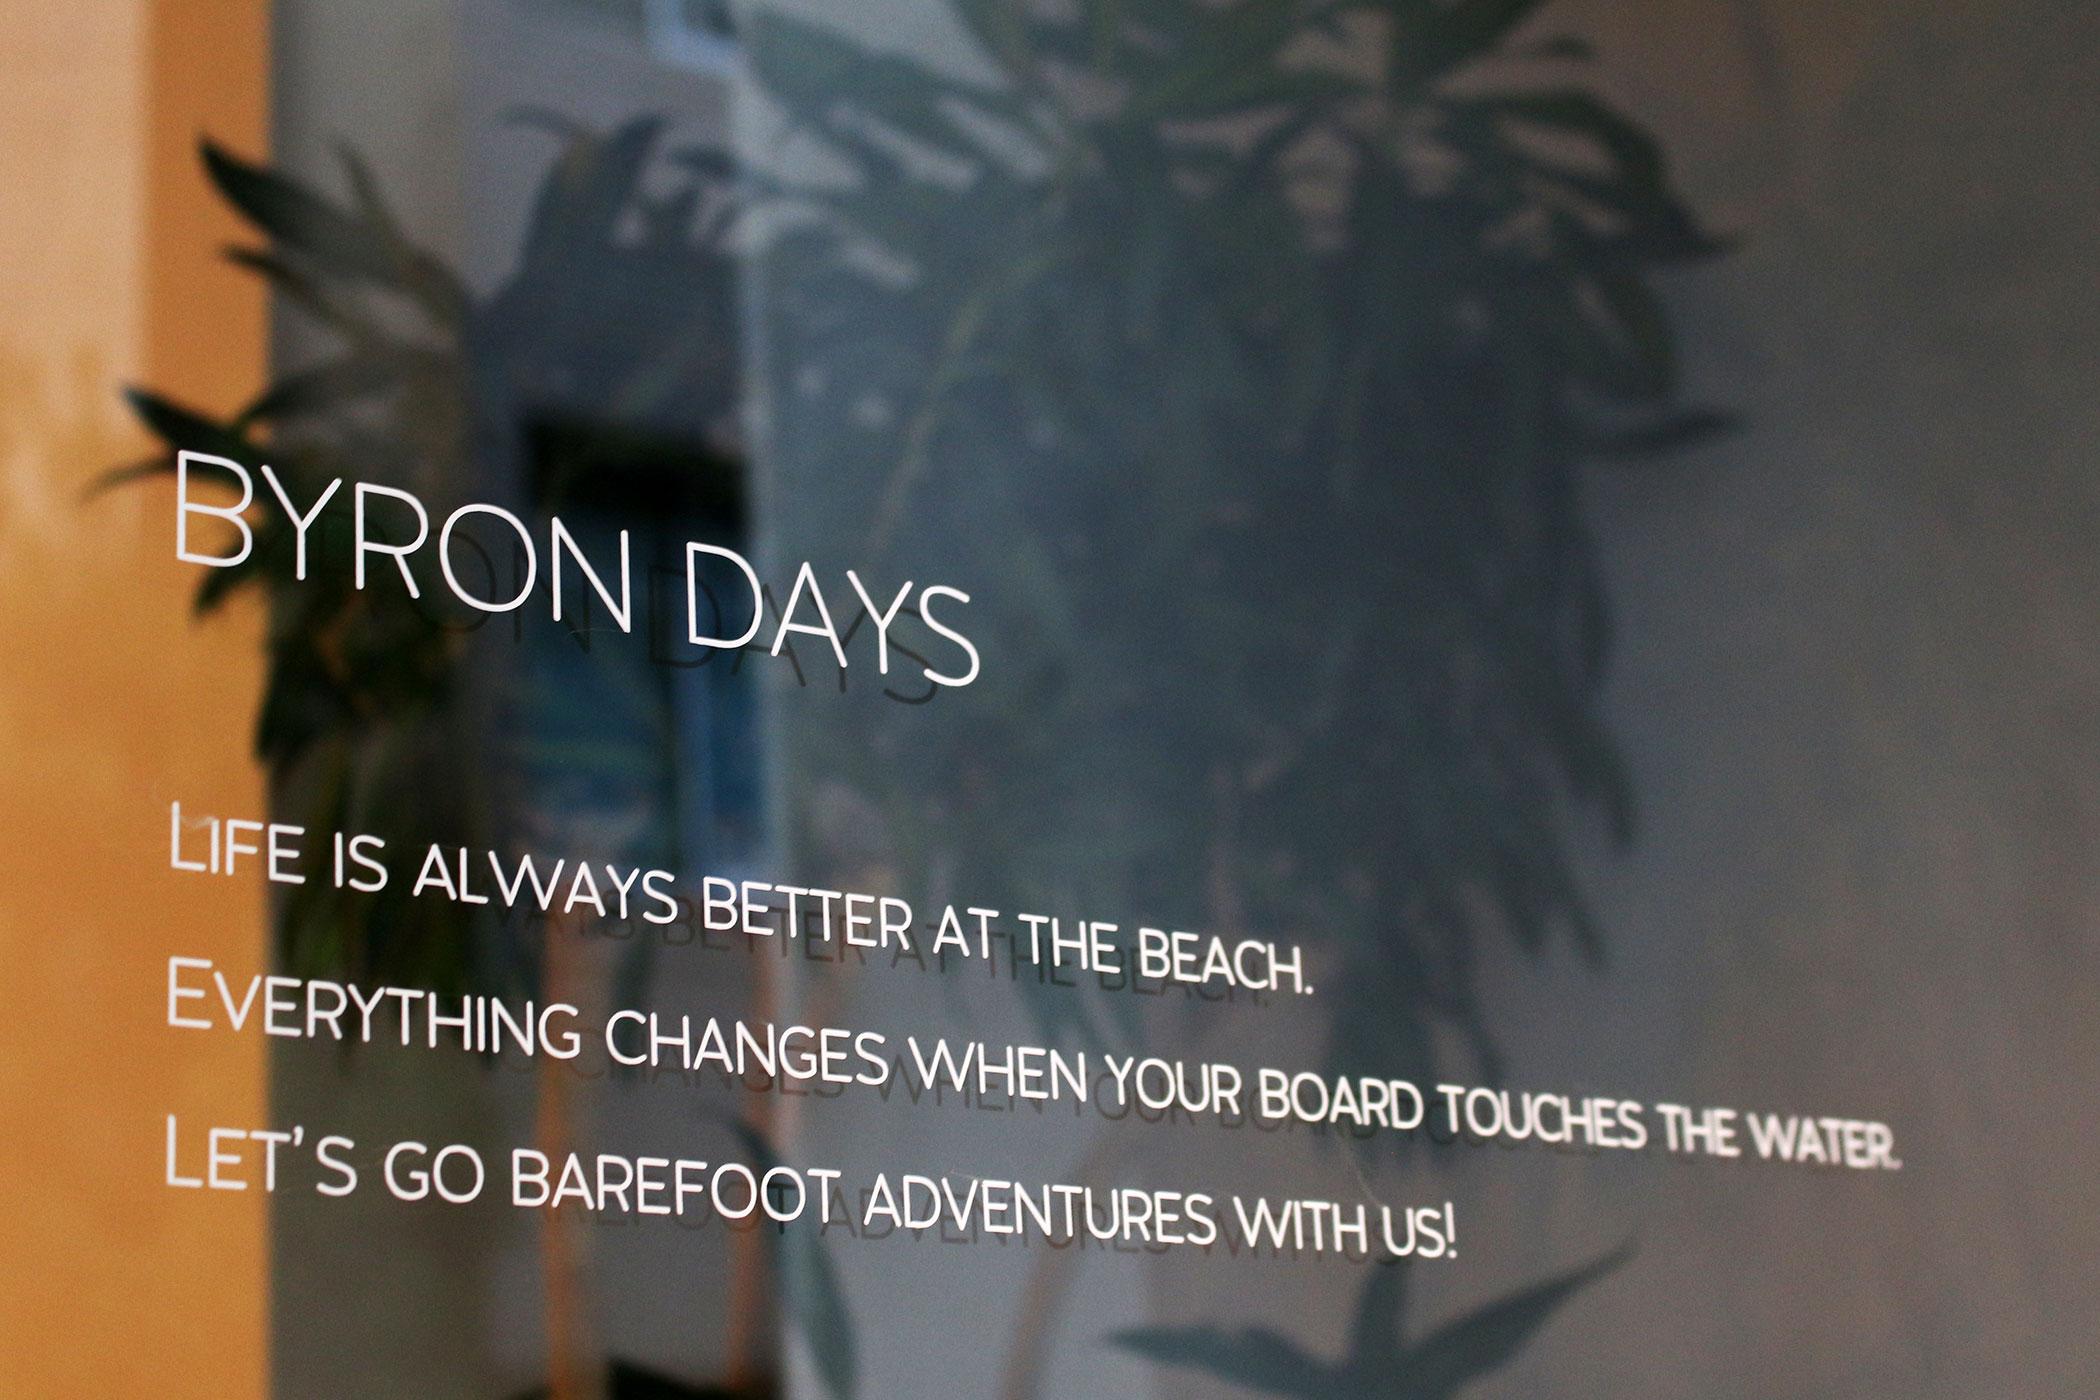 BYRON DAYS (バイロンデイズ) - 神戸